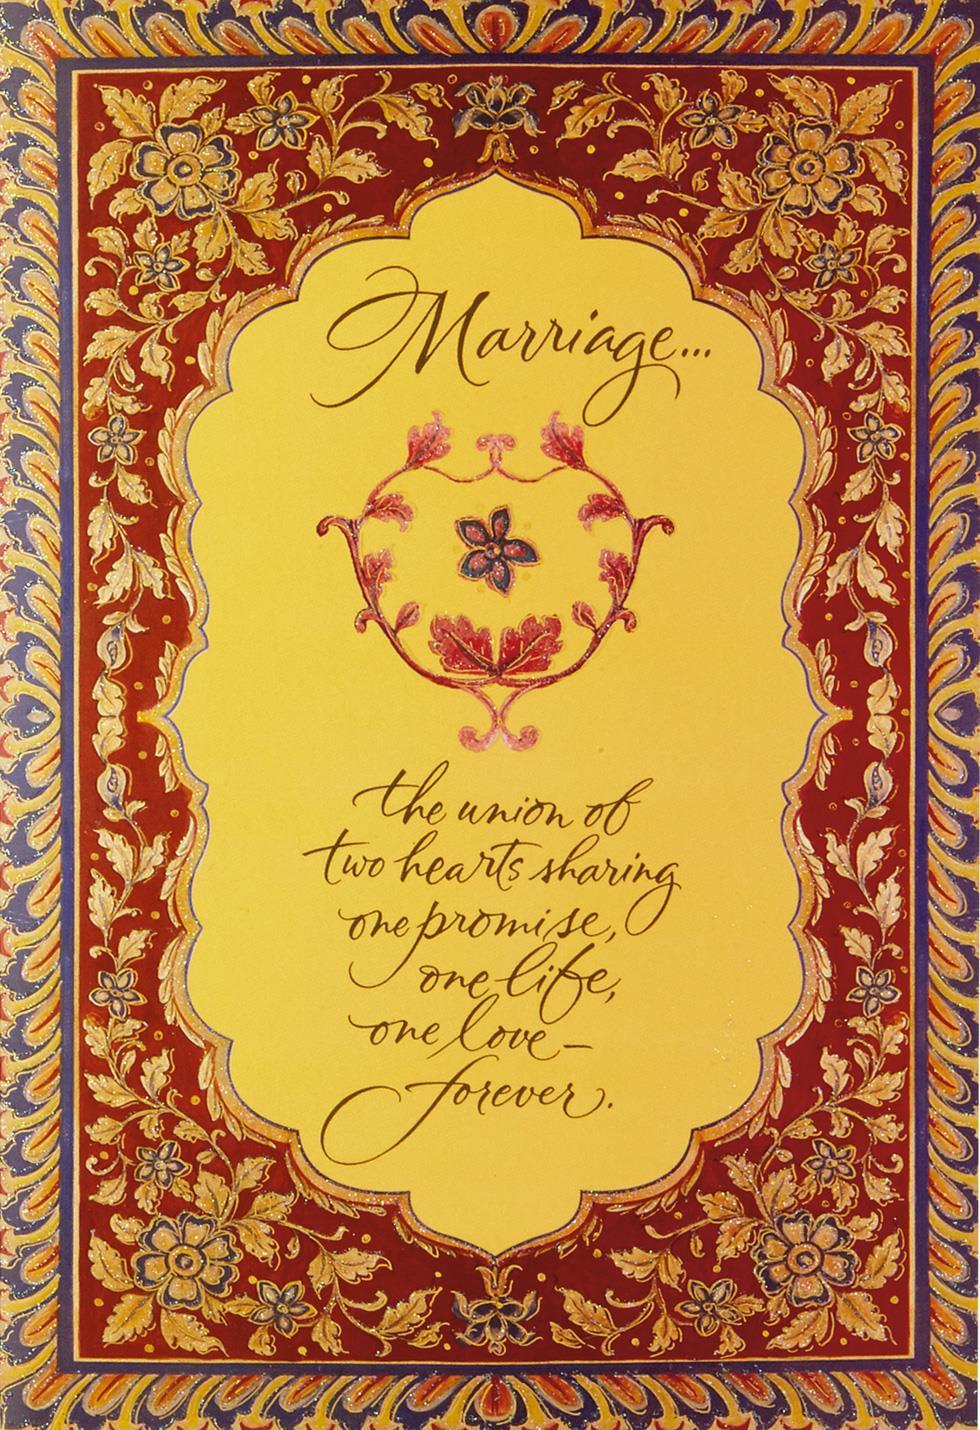 A Beautiful Forever Wedding Card Greeting Cards Hallmark